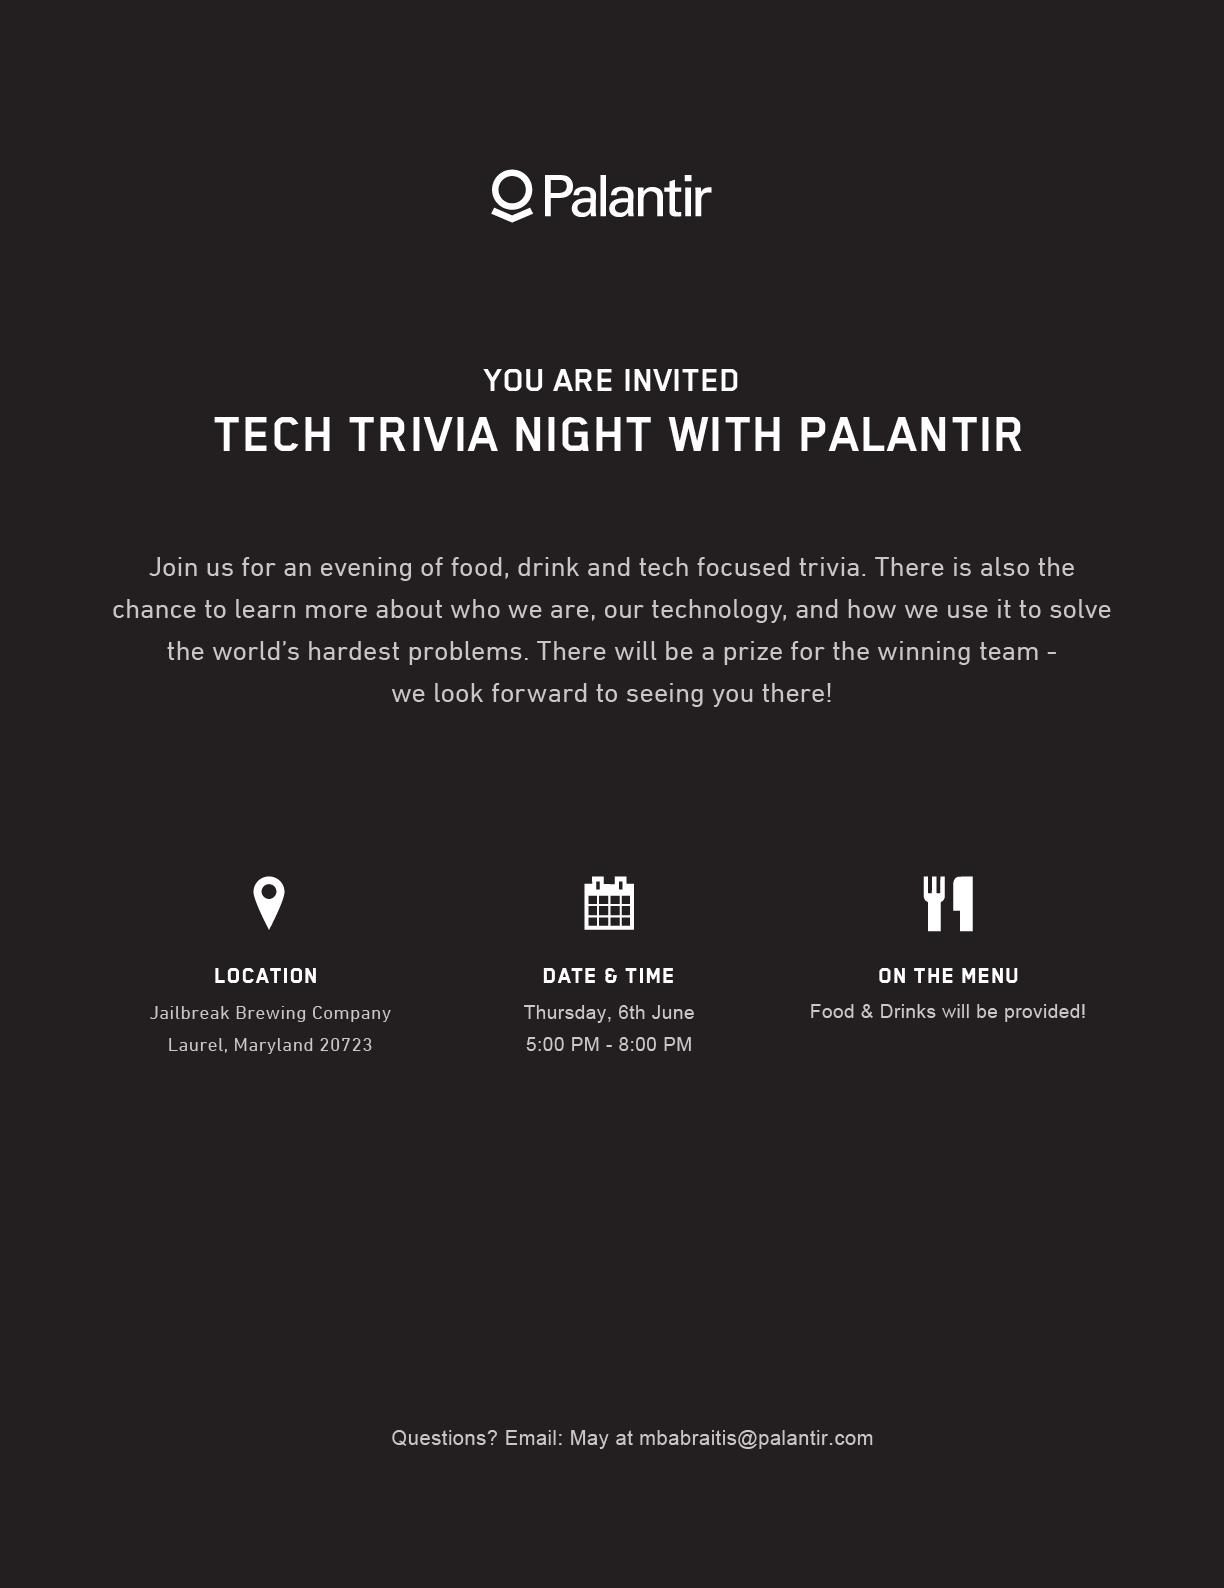 Tech Trivia Night with Palantir - Jailbreak Brewing Company